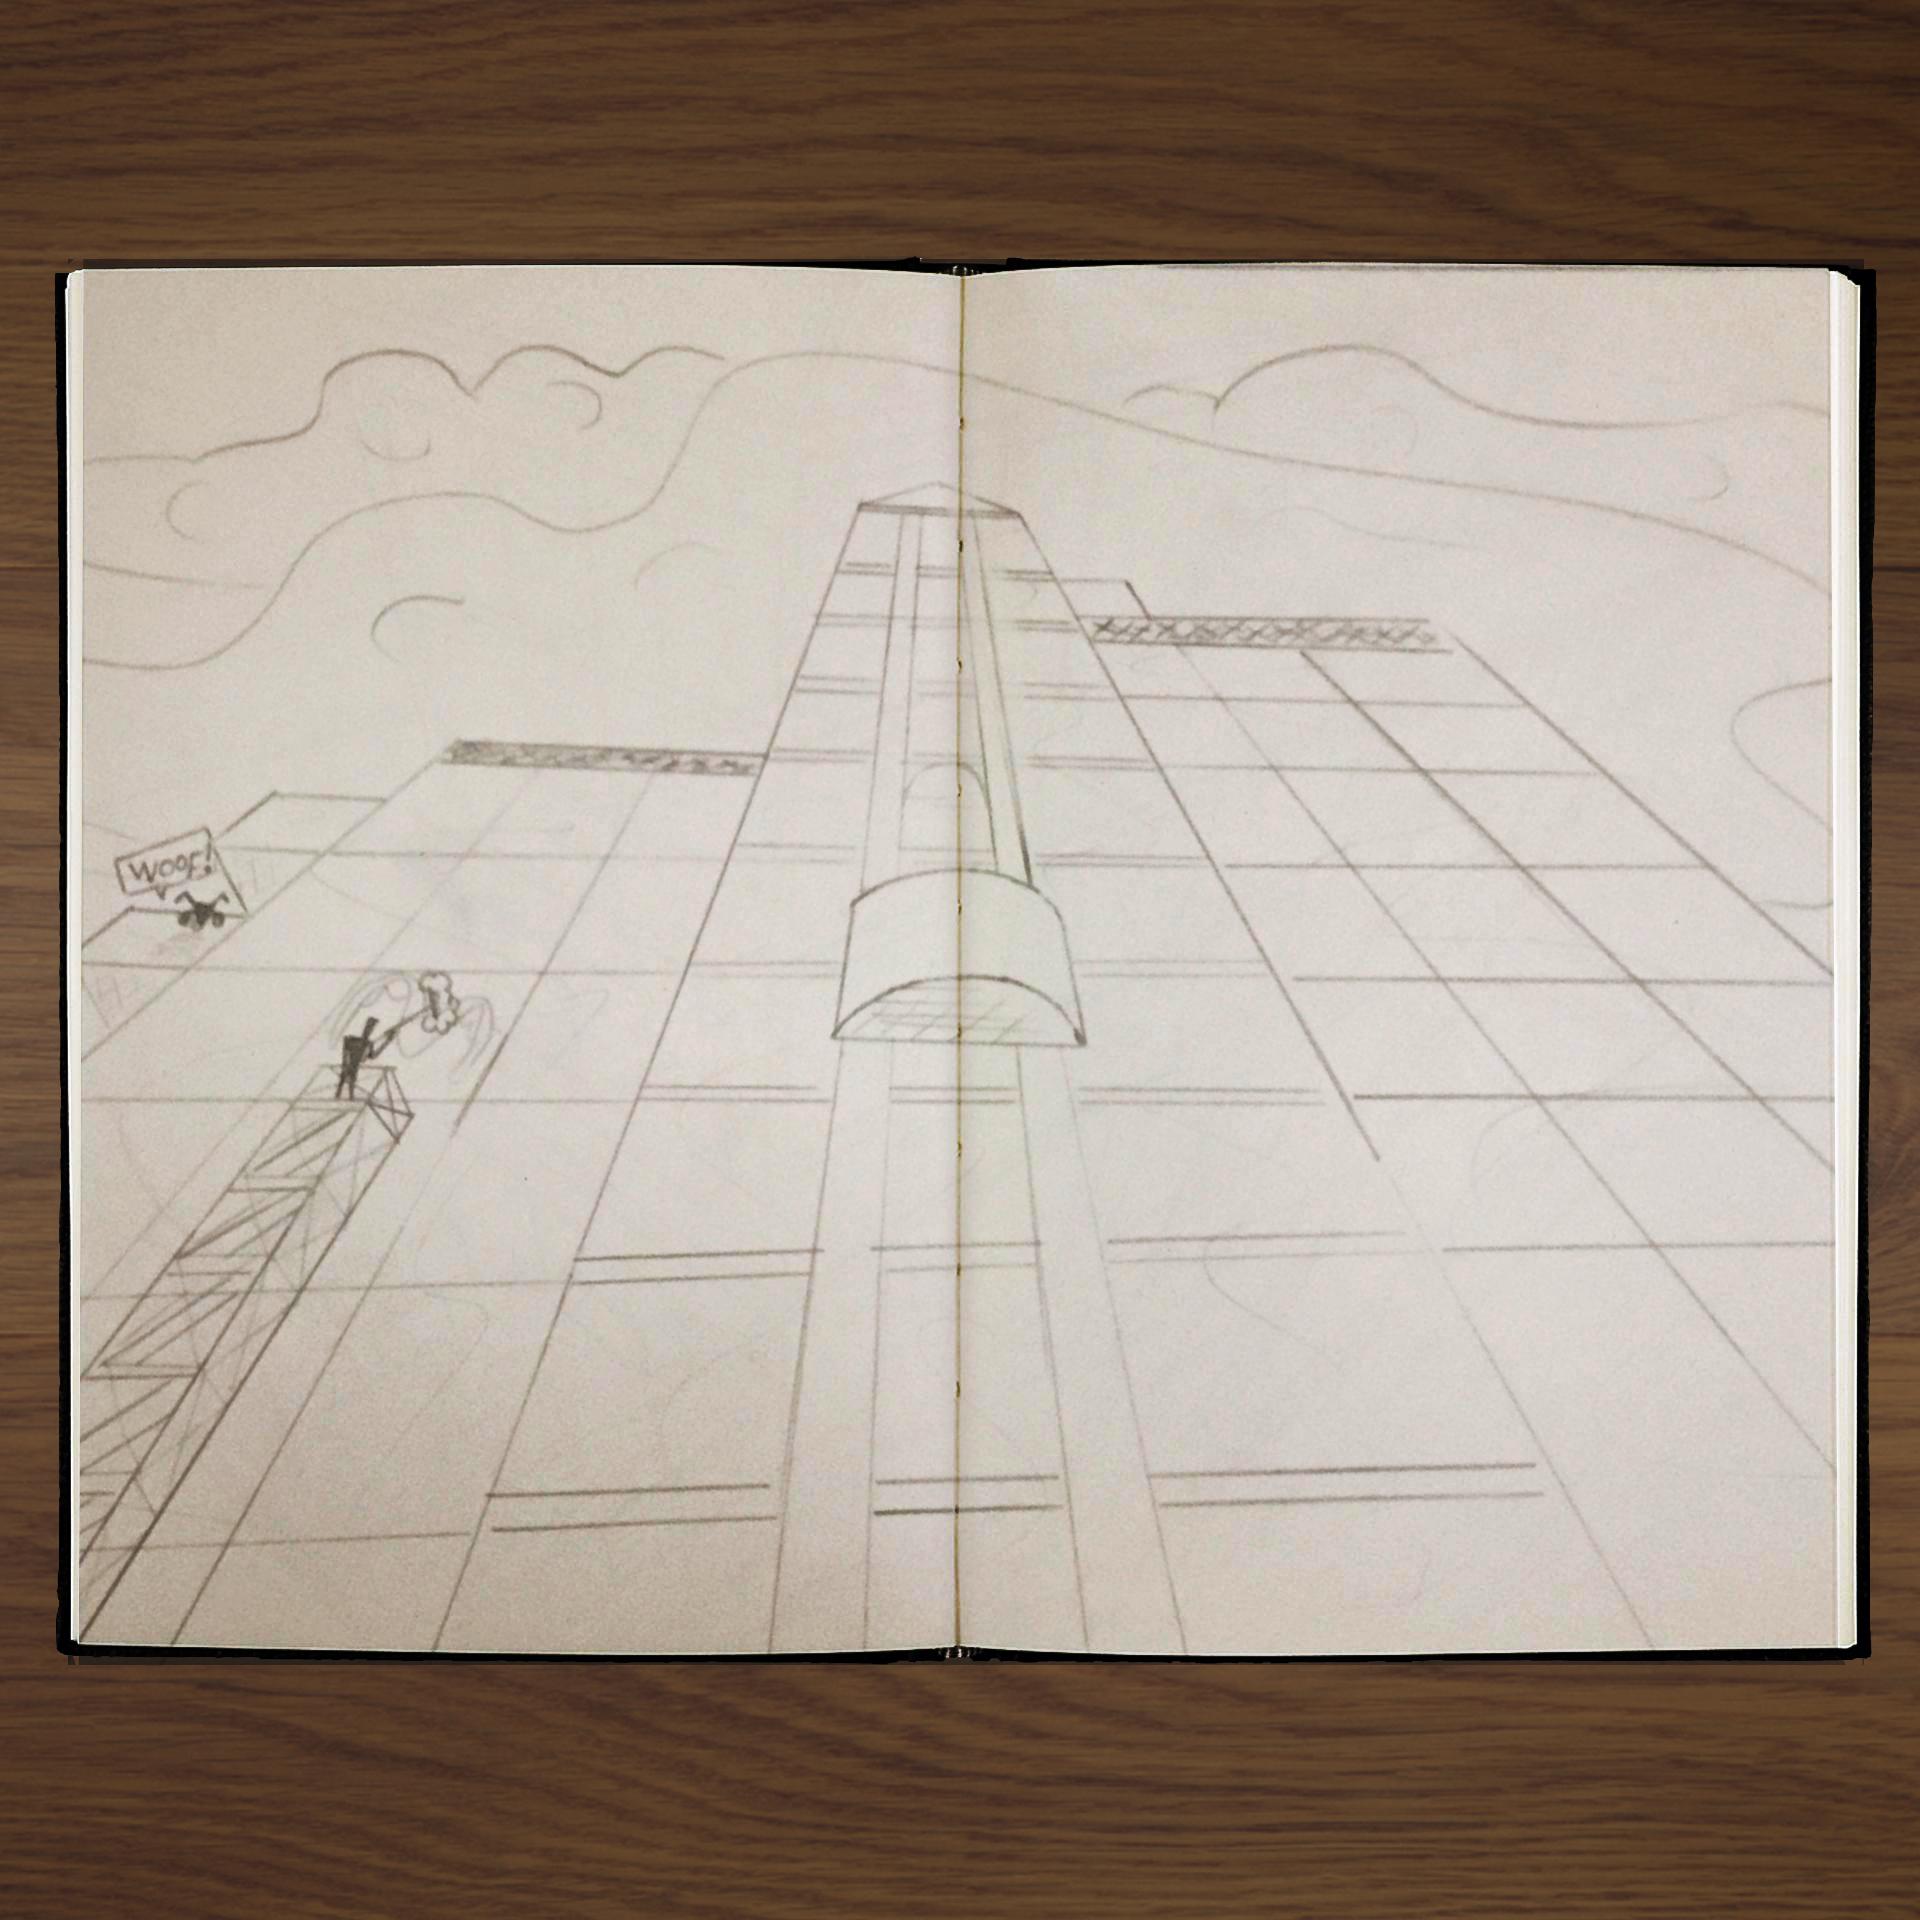 Perpective Drawing - Pencil